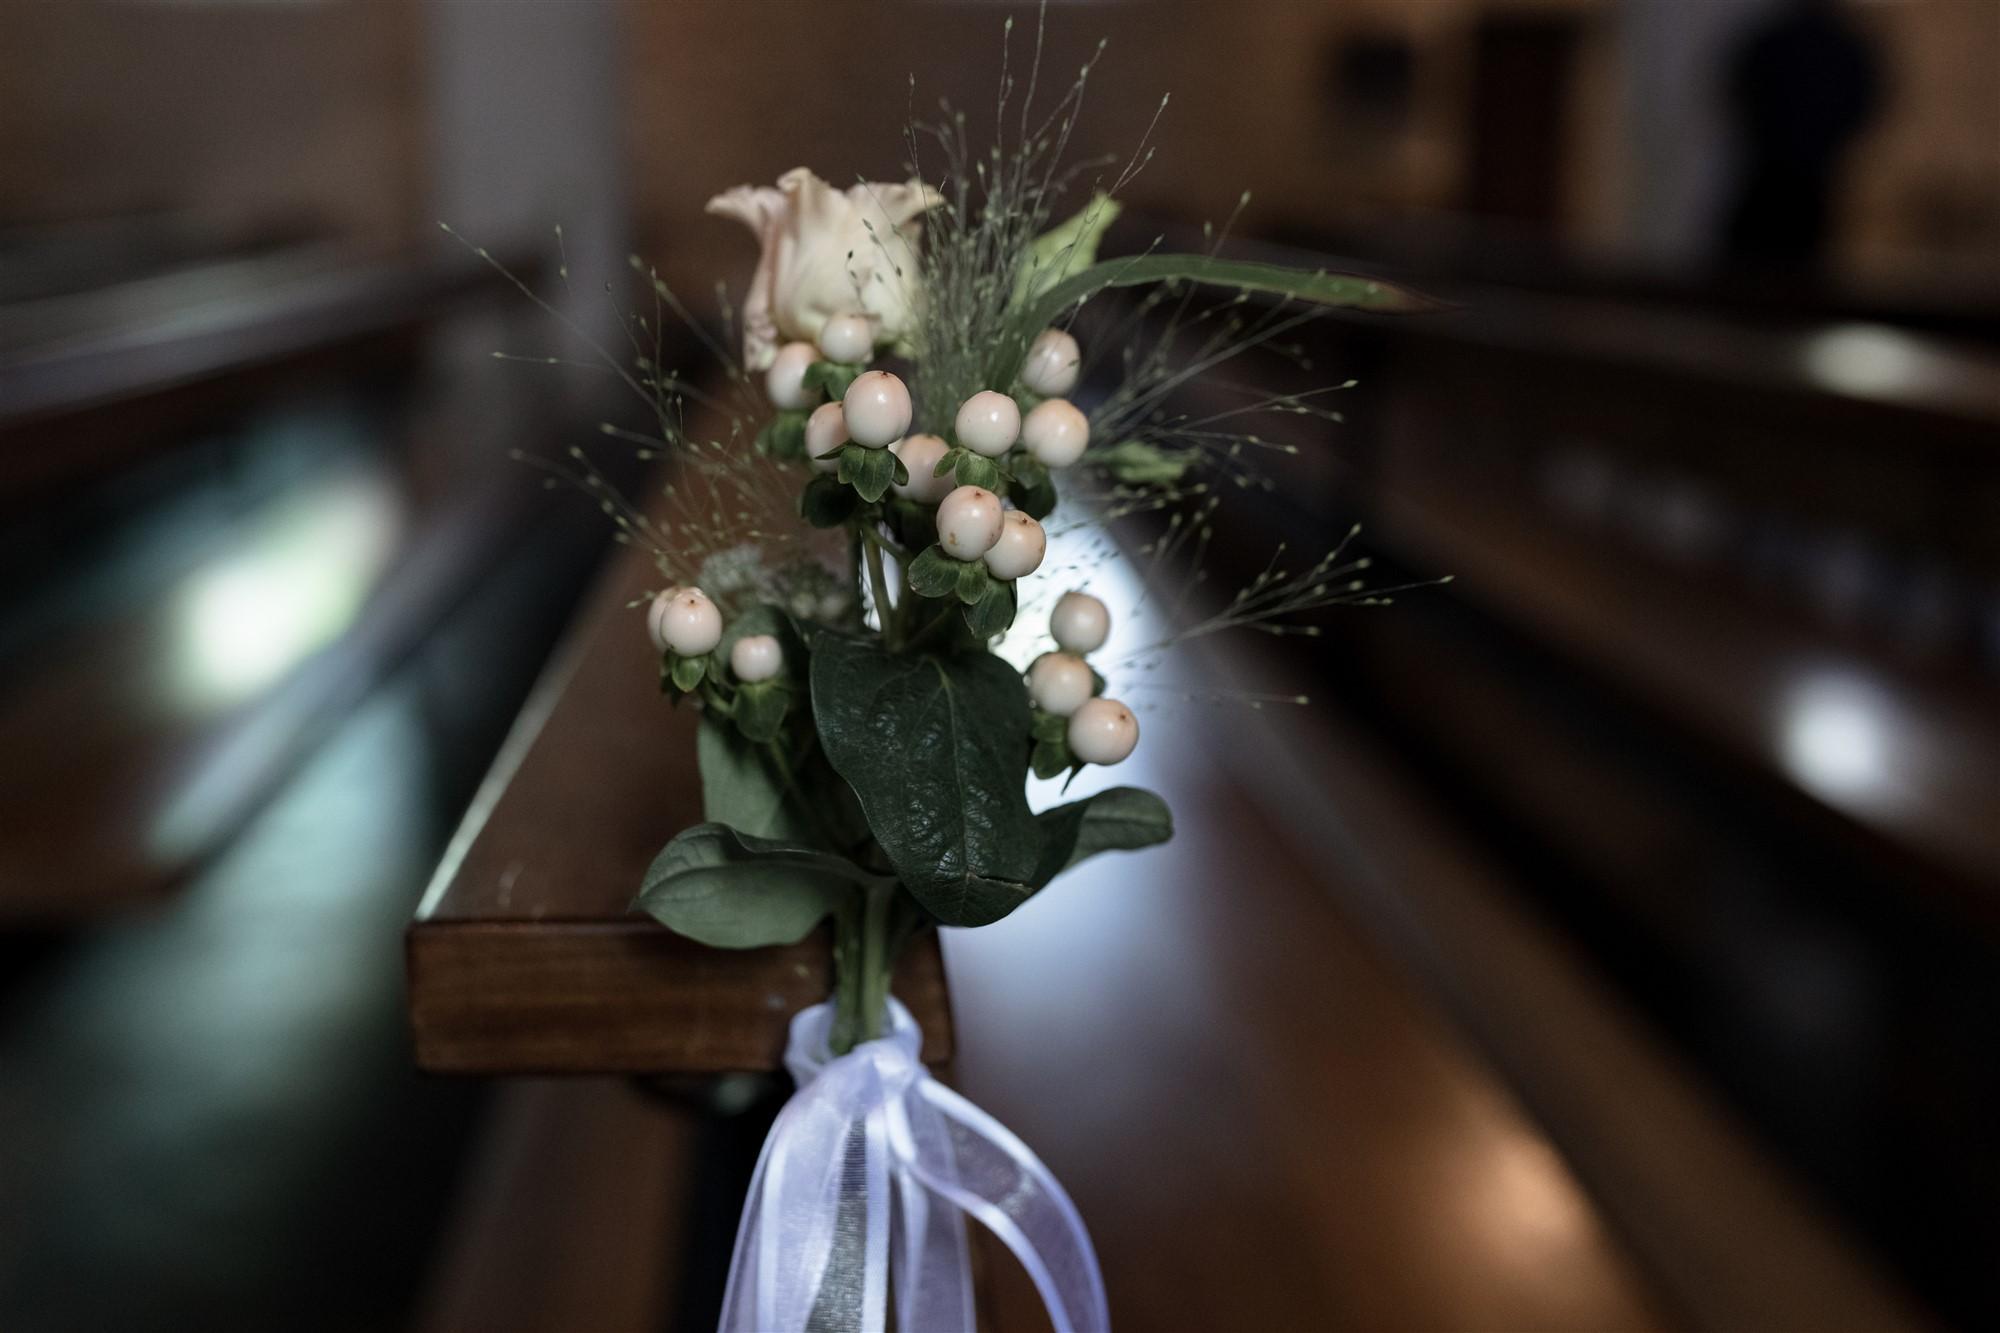 Blumendekoration in der Kirche in Oberwil